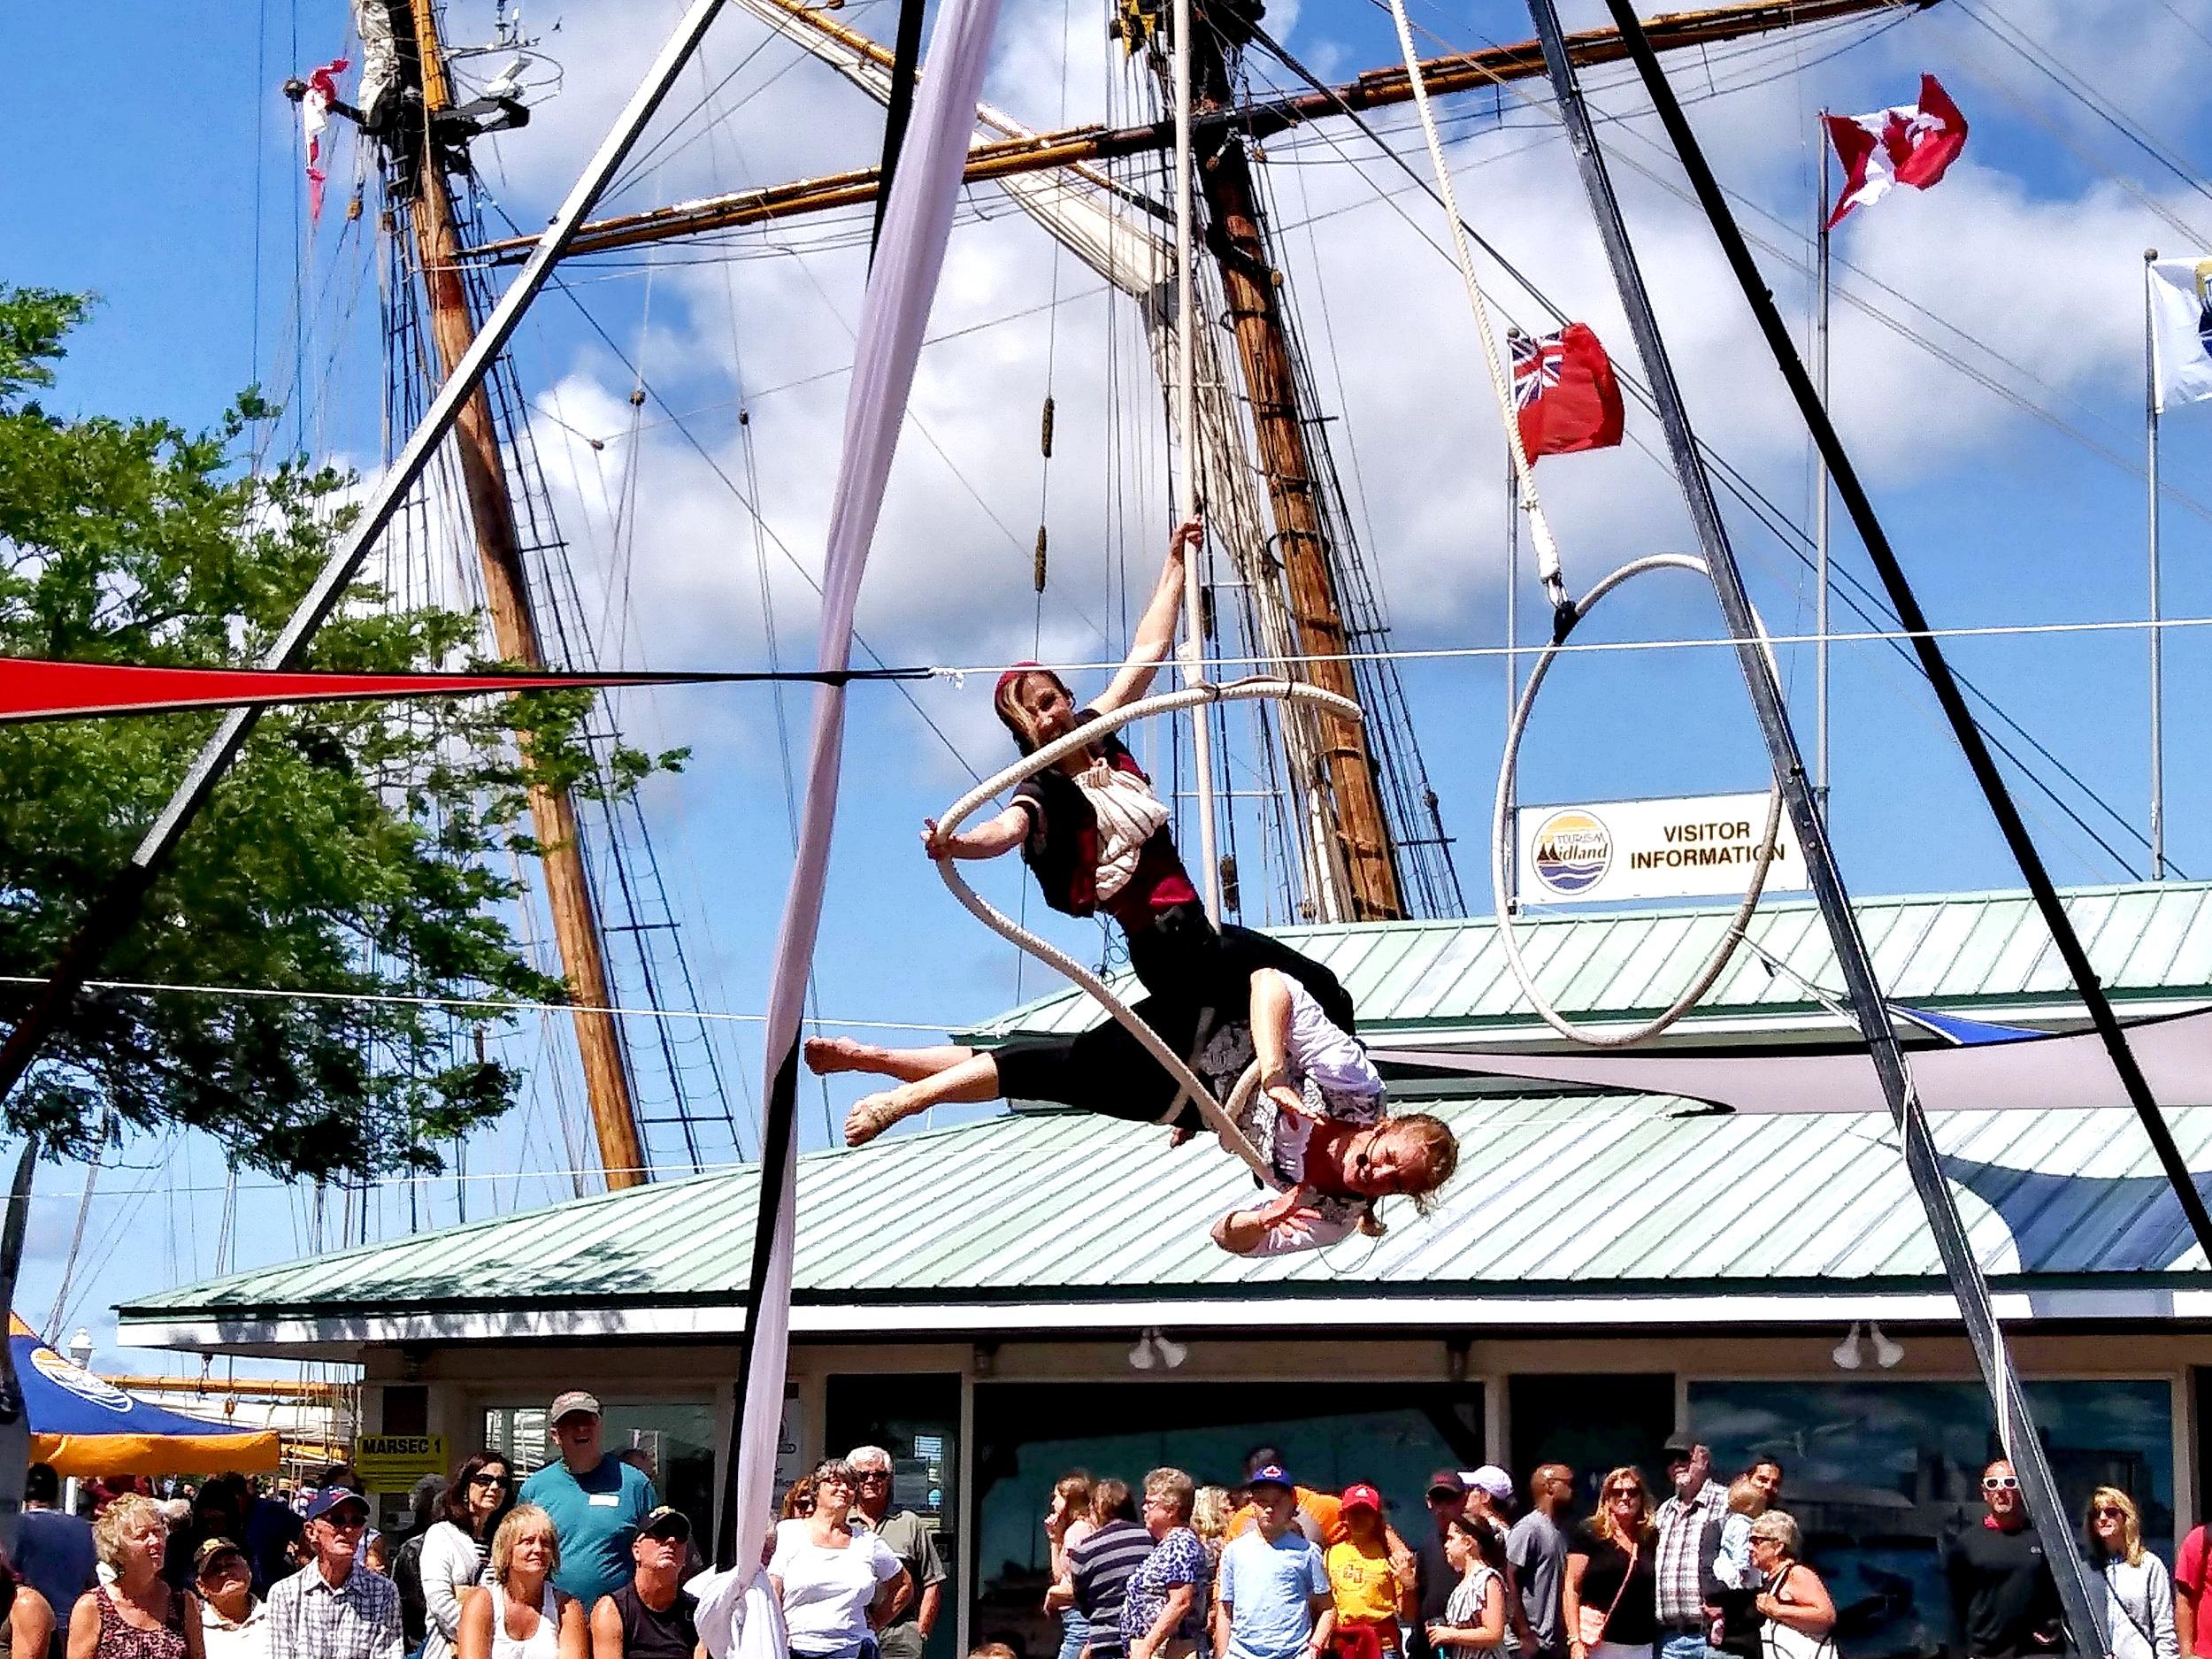 Aerial Pirate Show